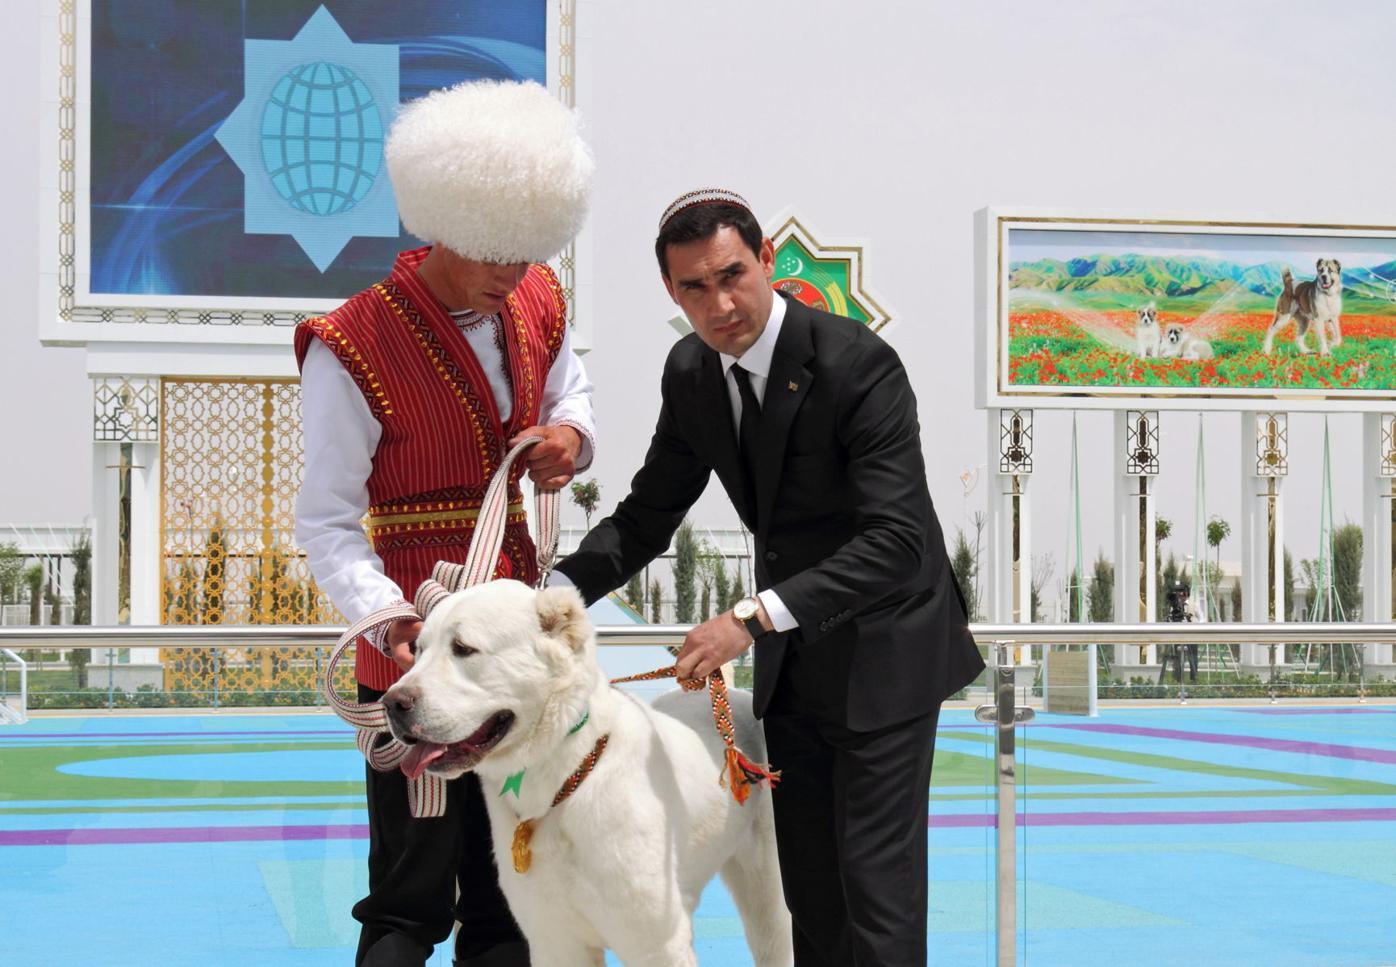 Turkmenistan's Deputy Prime Minister Serdar Berdymukhamedov takes part in celebrations for the national Turkmen Horse Day and the Turkmen Shepherd Dog Day, near Ashgabat